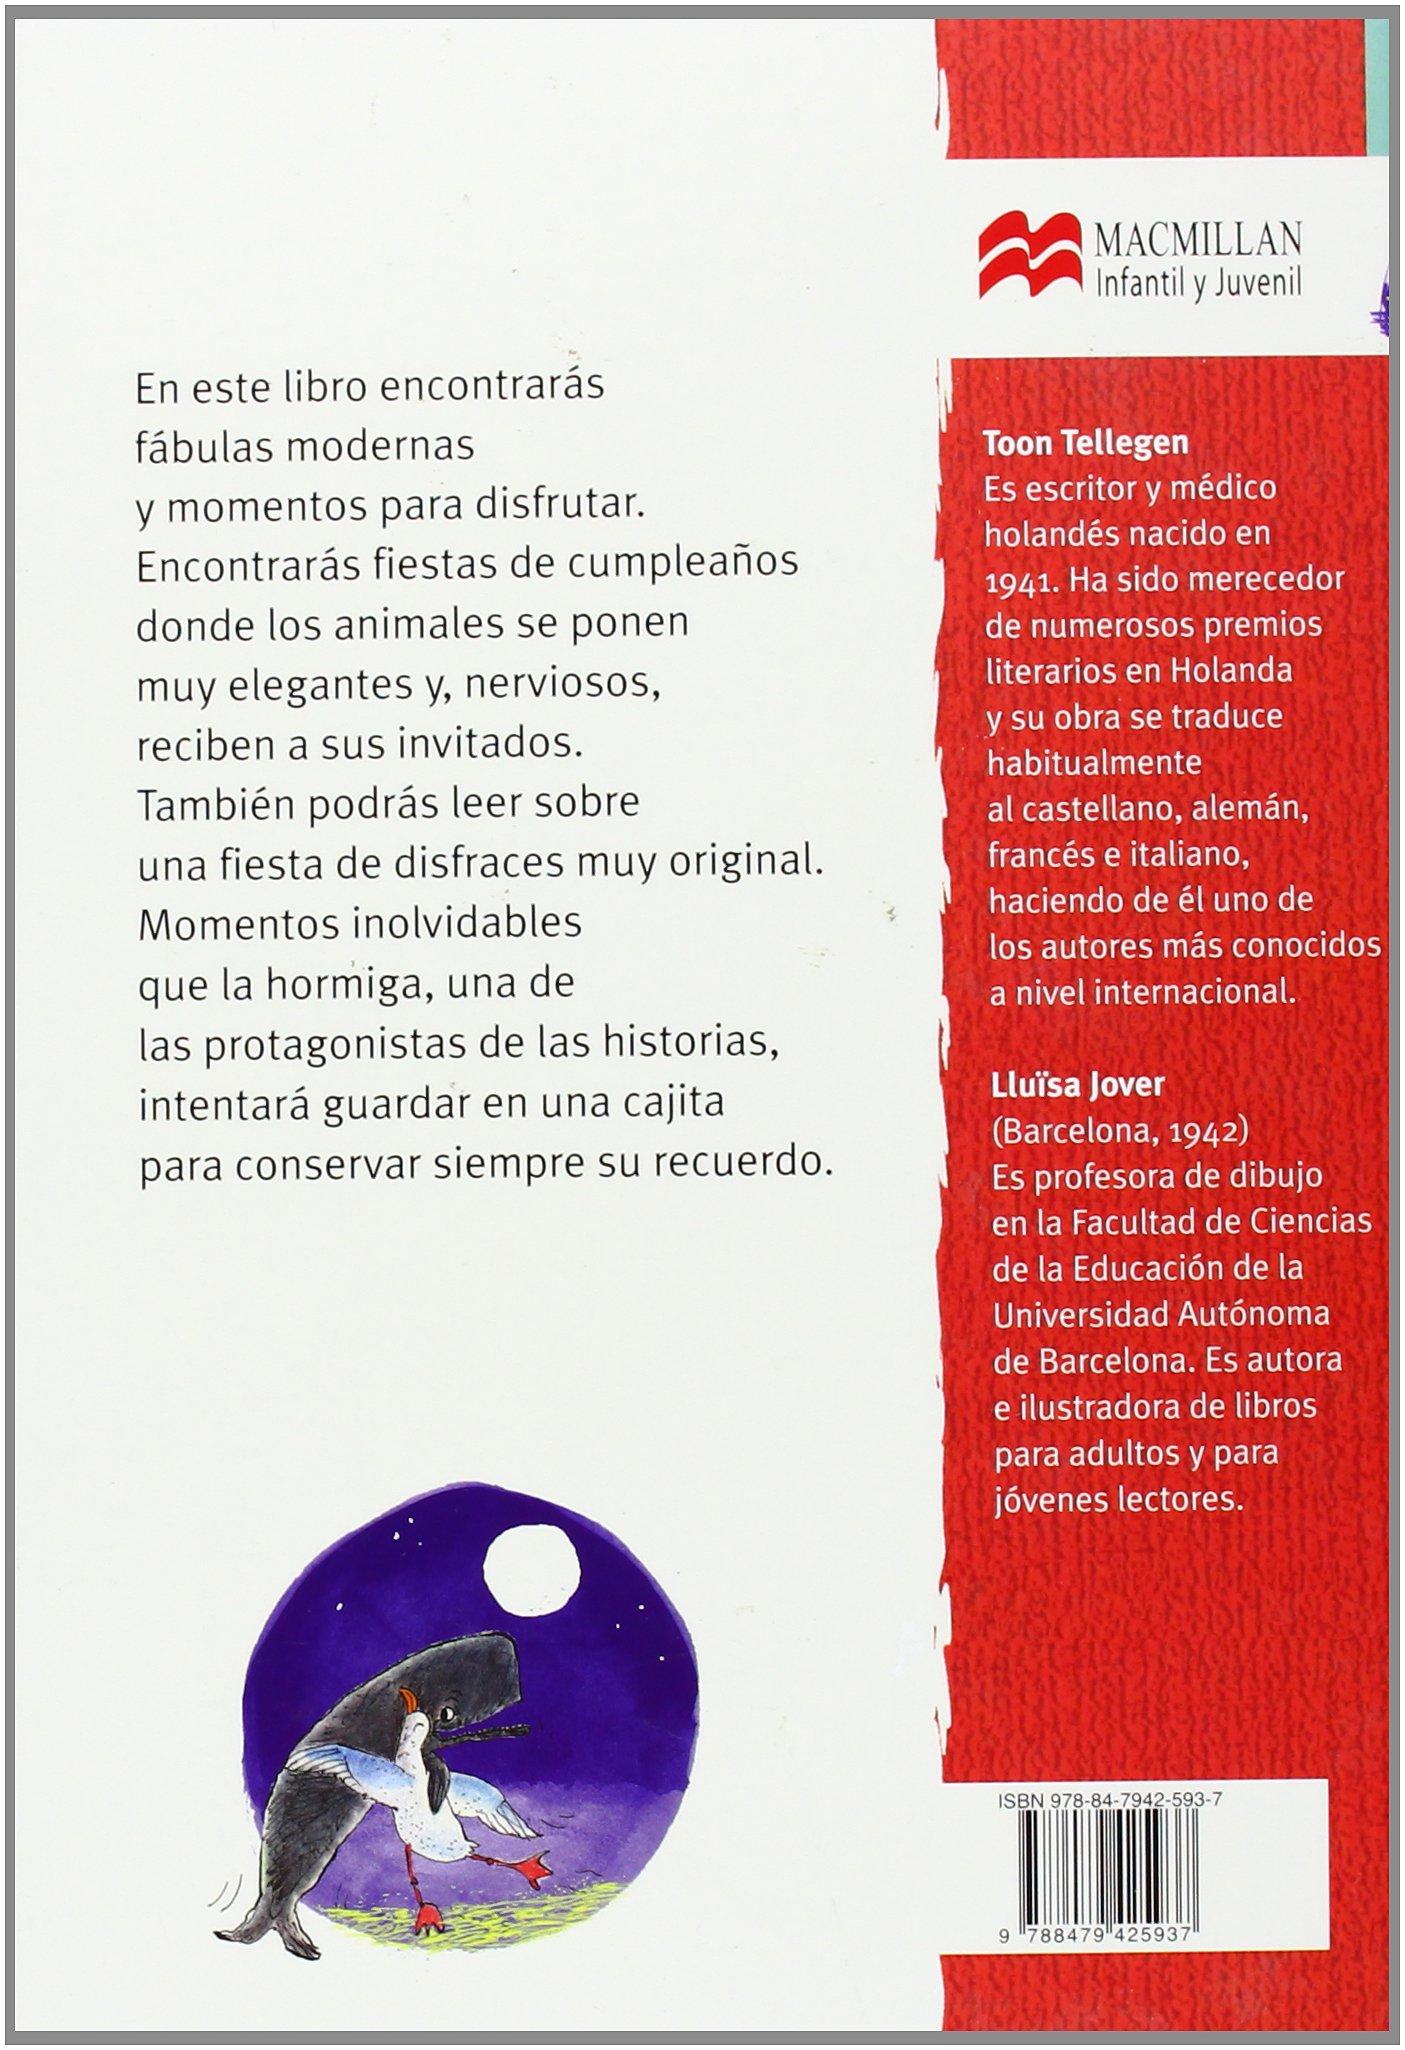 La fiesta de cumpleaños (Librosaurio) (Spanish Edition): Toon Tellegen, Llüisa Jover: 9788479425937: Amazon.com: Books